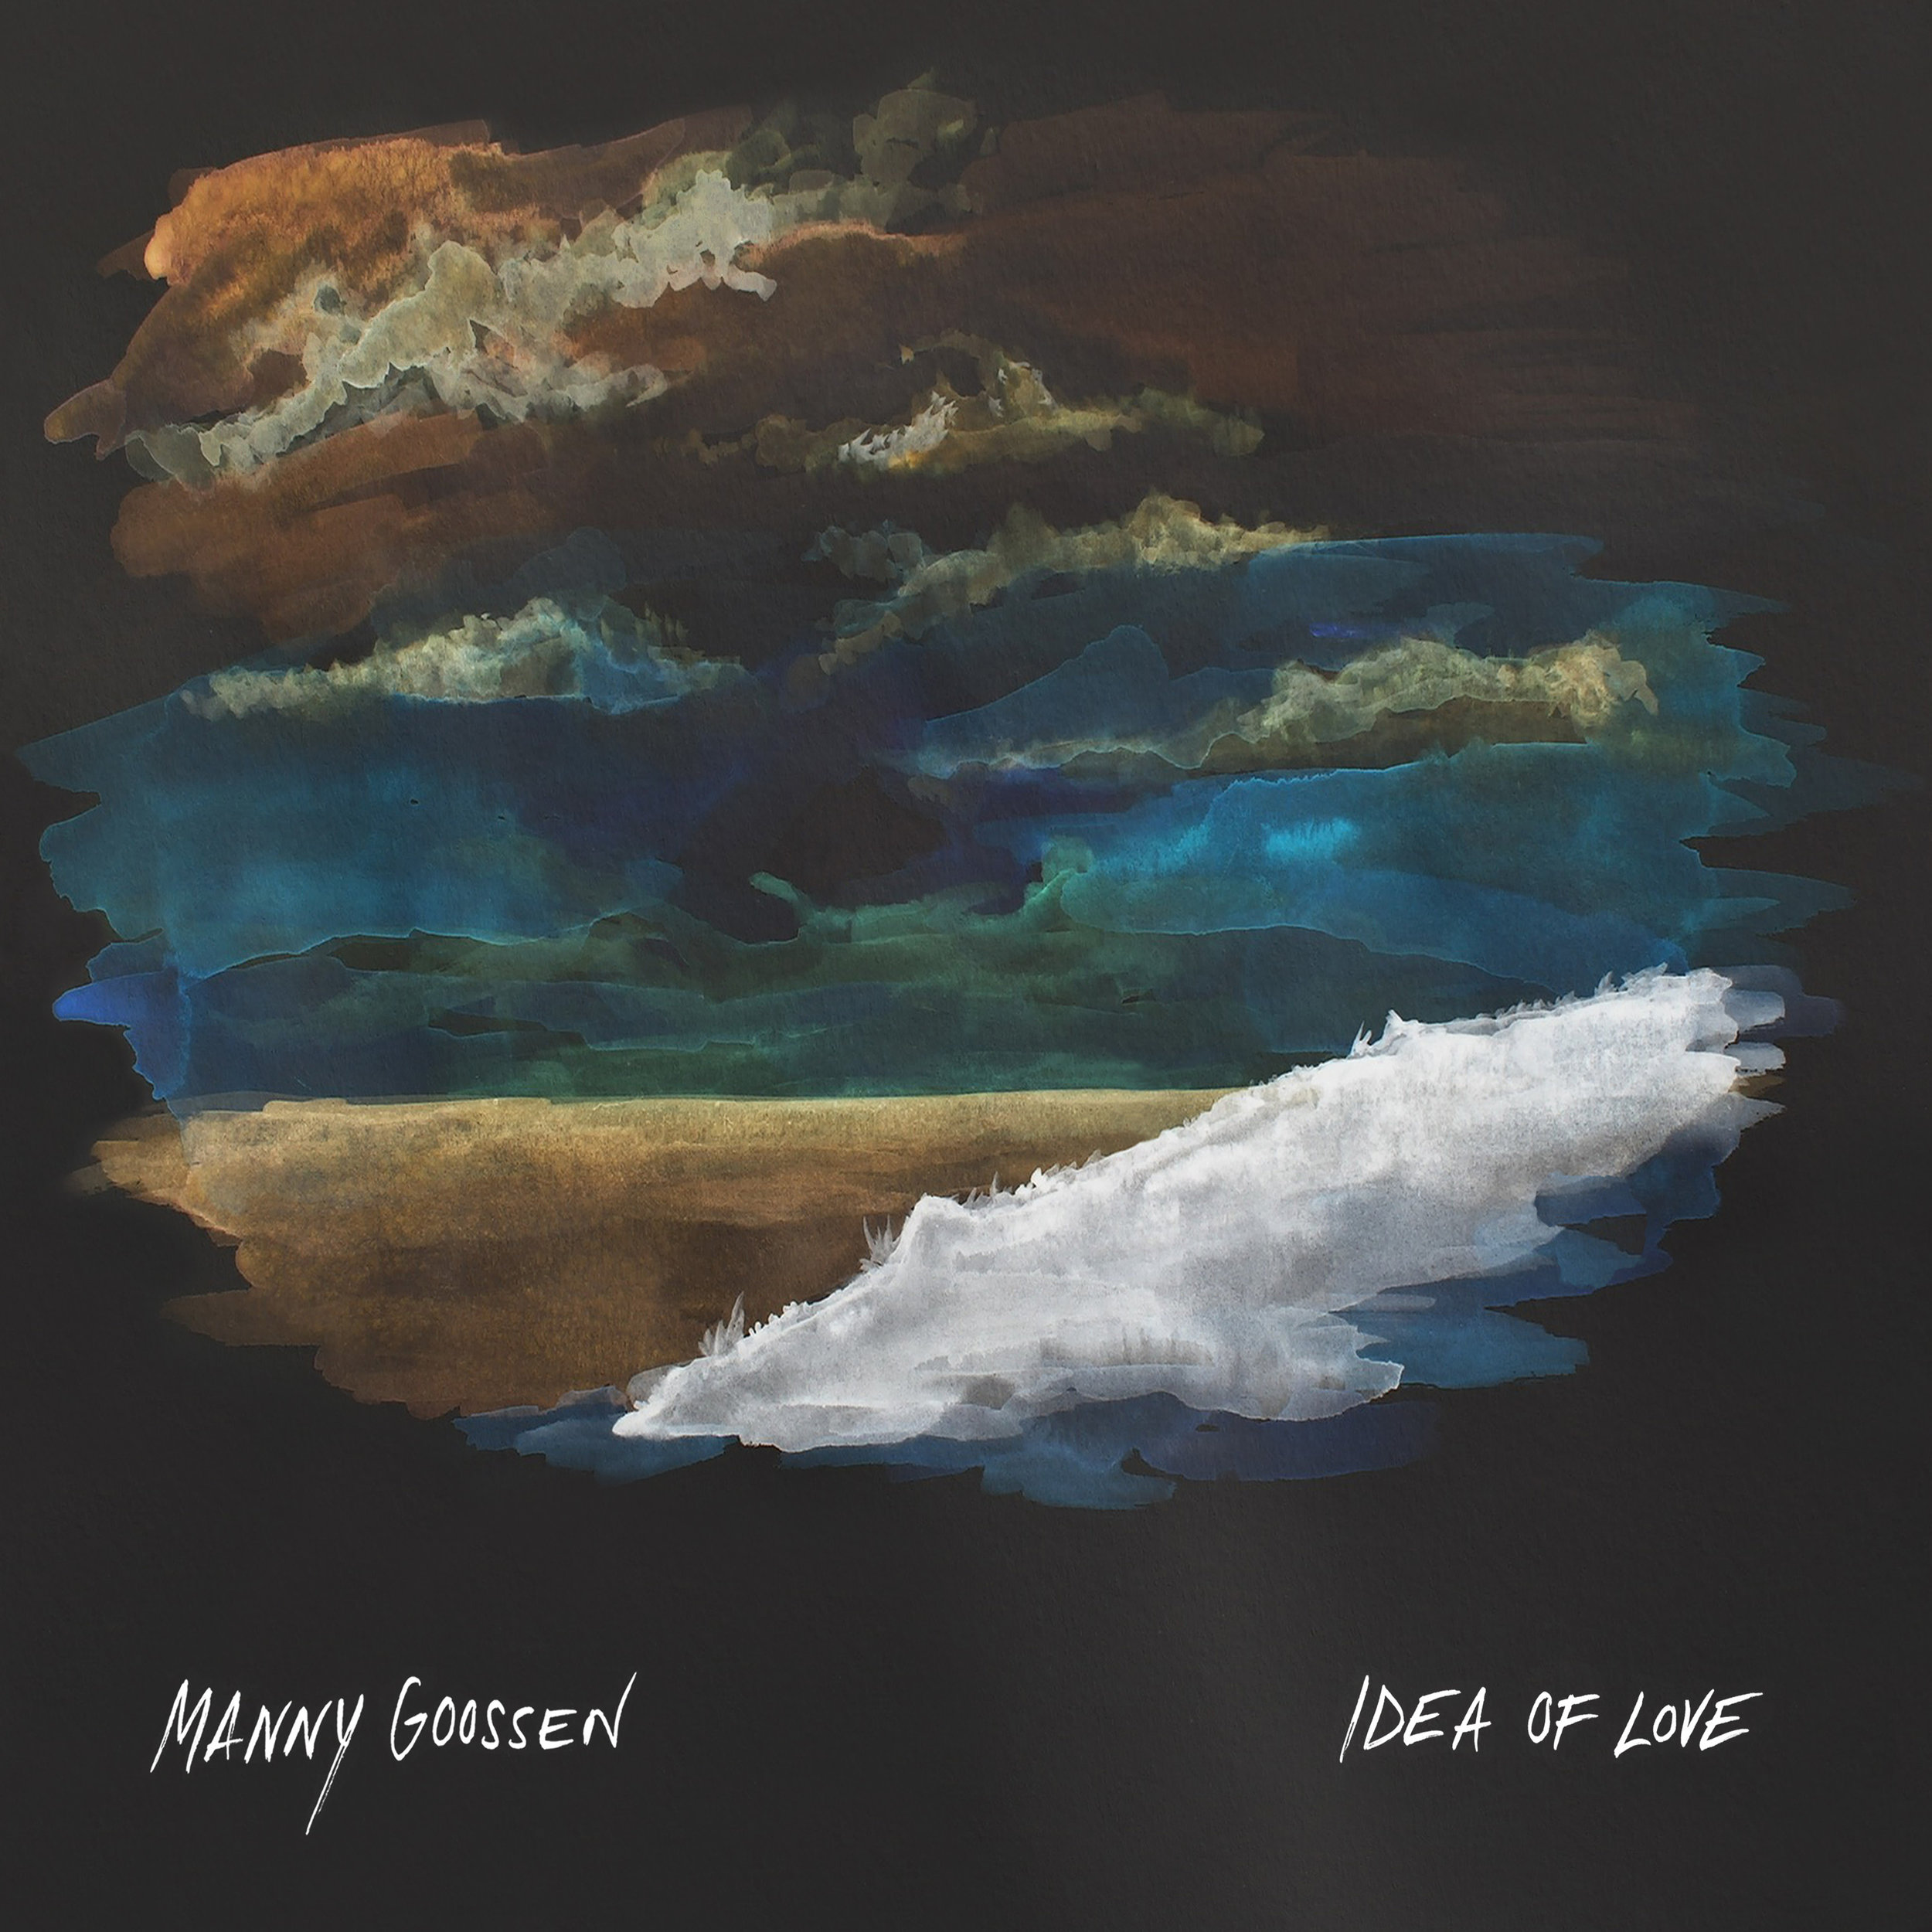 Idea of Love  - Debut Album, released June 23, 2017